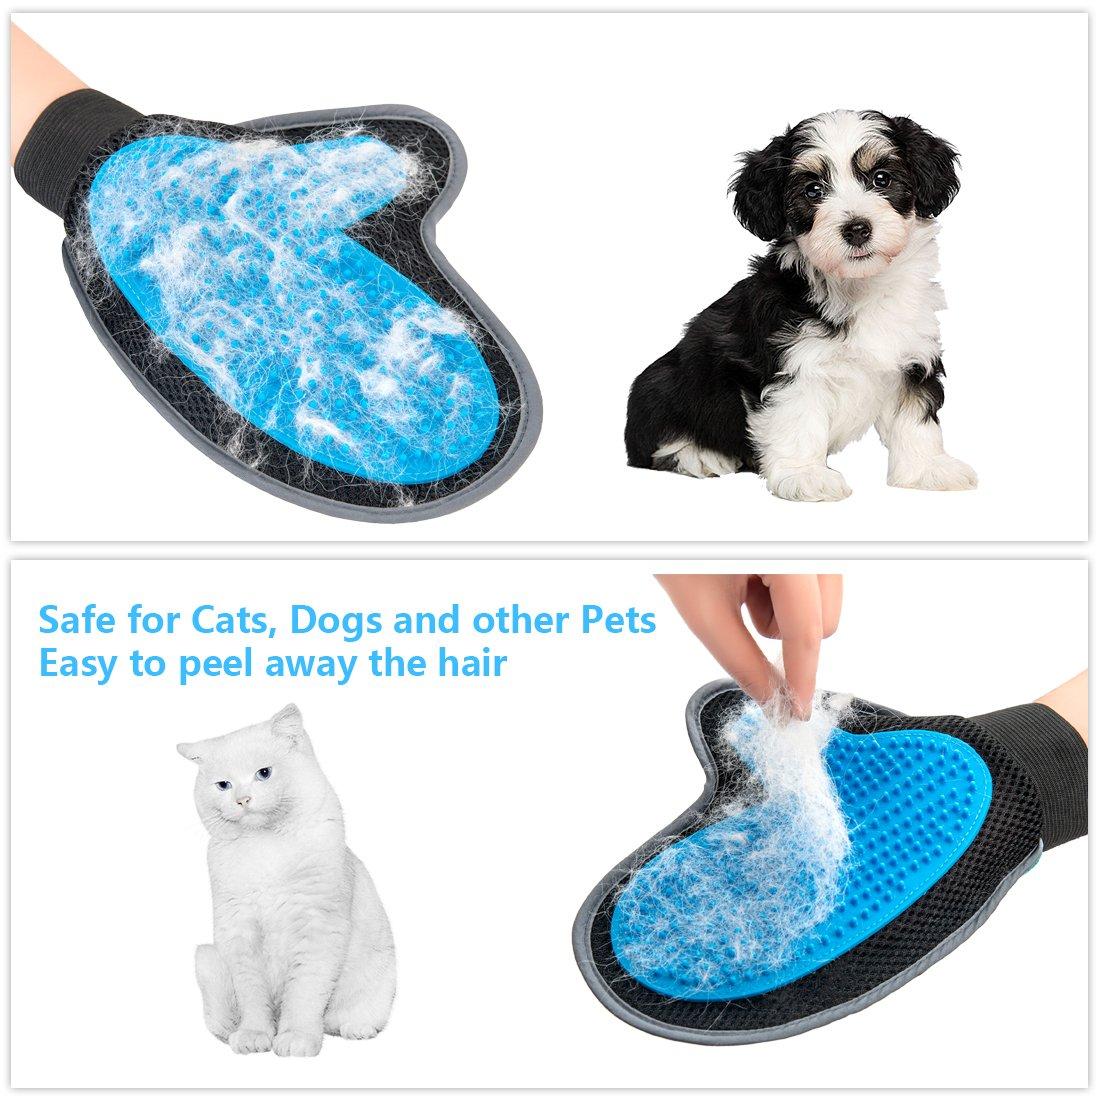 Bonve Pet Guantes para Perro Cepillo Masaje Perro Peine Guante Quitapelos Cepillo para Mascotas Herramientas de Peine de Pelos para Perros Gatos ...